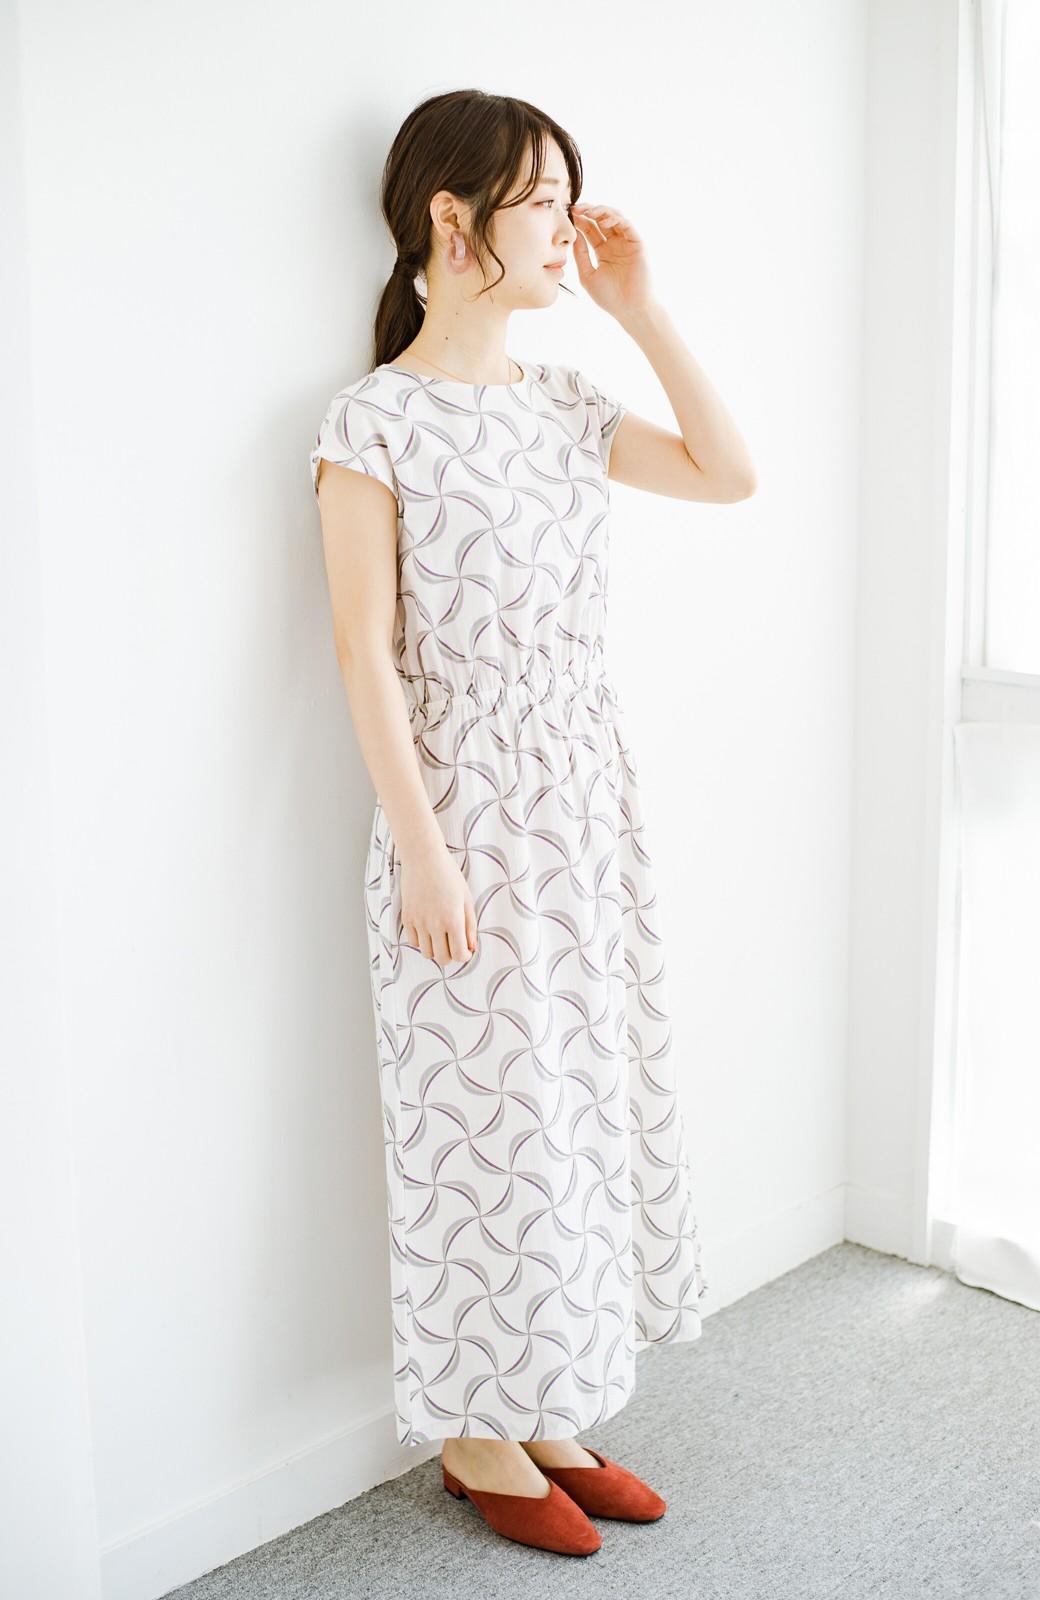 haco! 京都の浴衣屋さんと作った浴衣生地のウエストマークワンピース <ホワイト系その他>の商品写真12